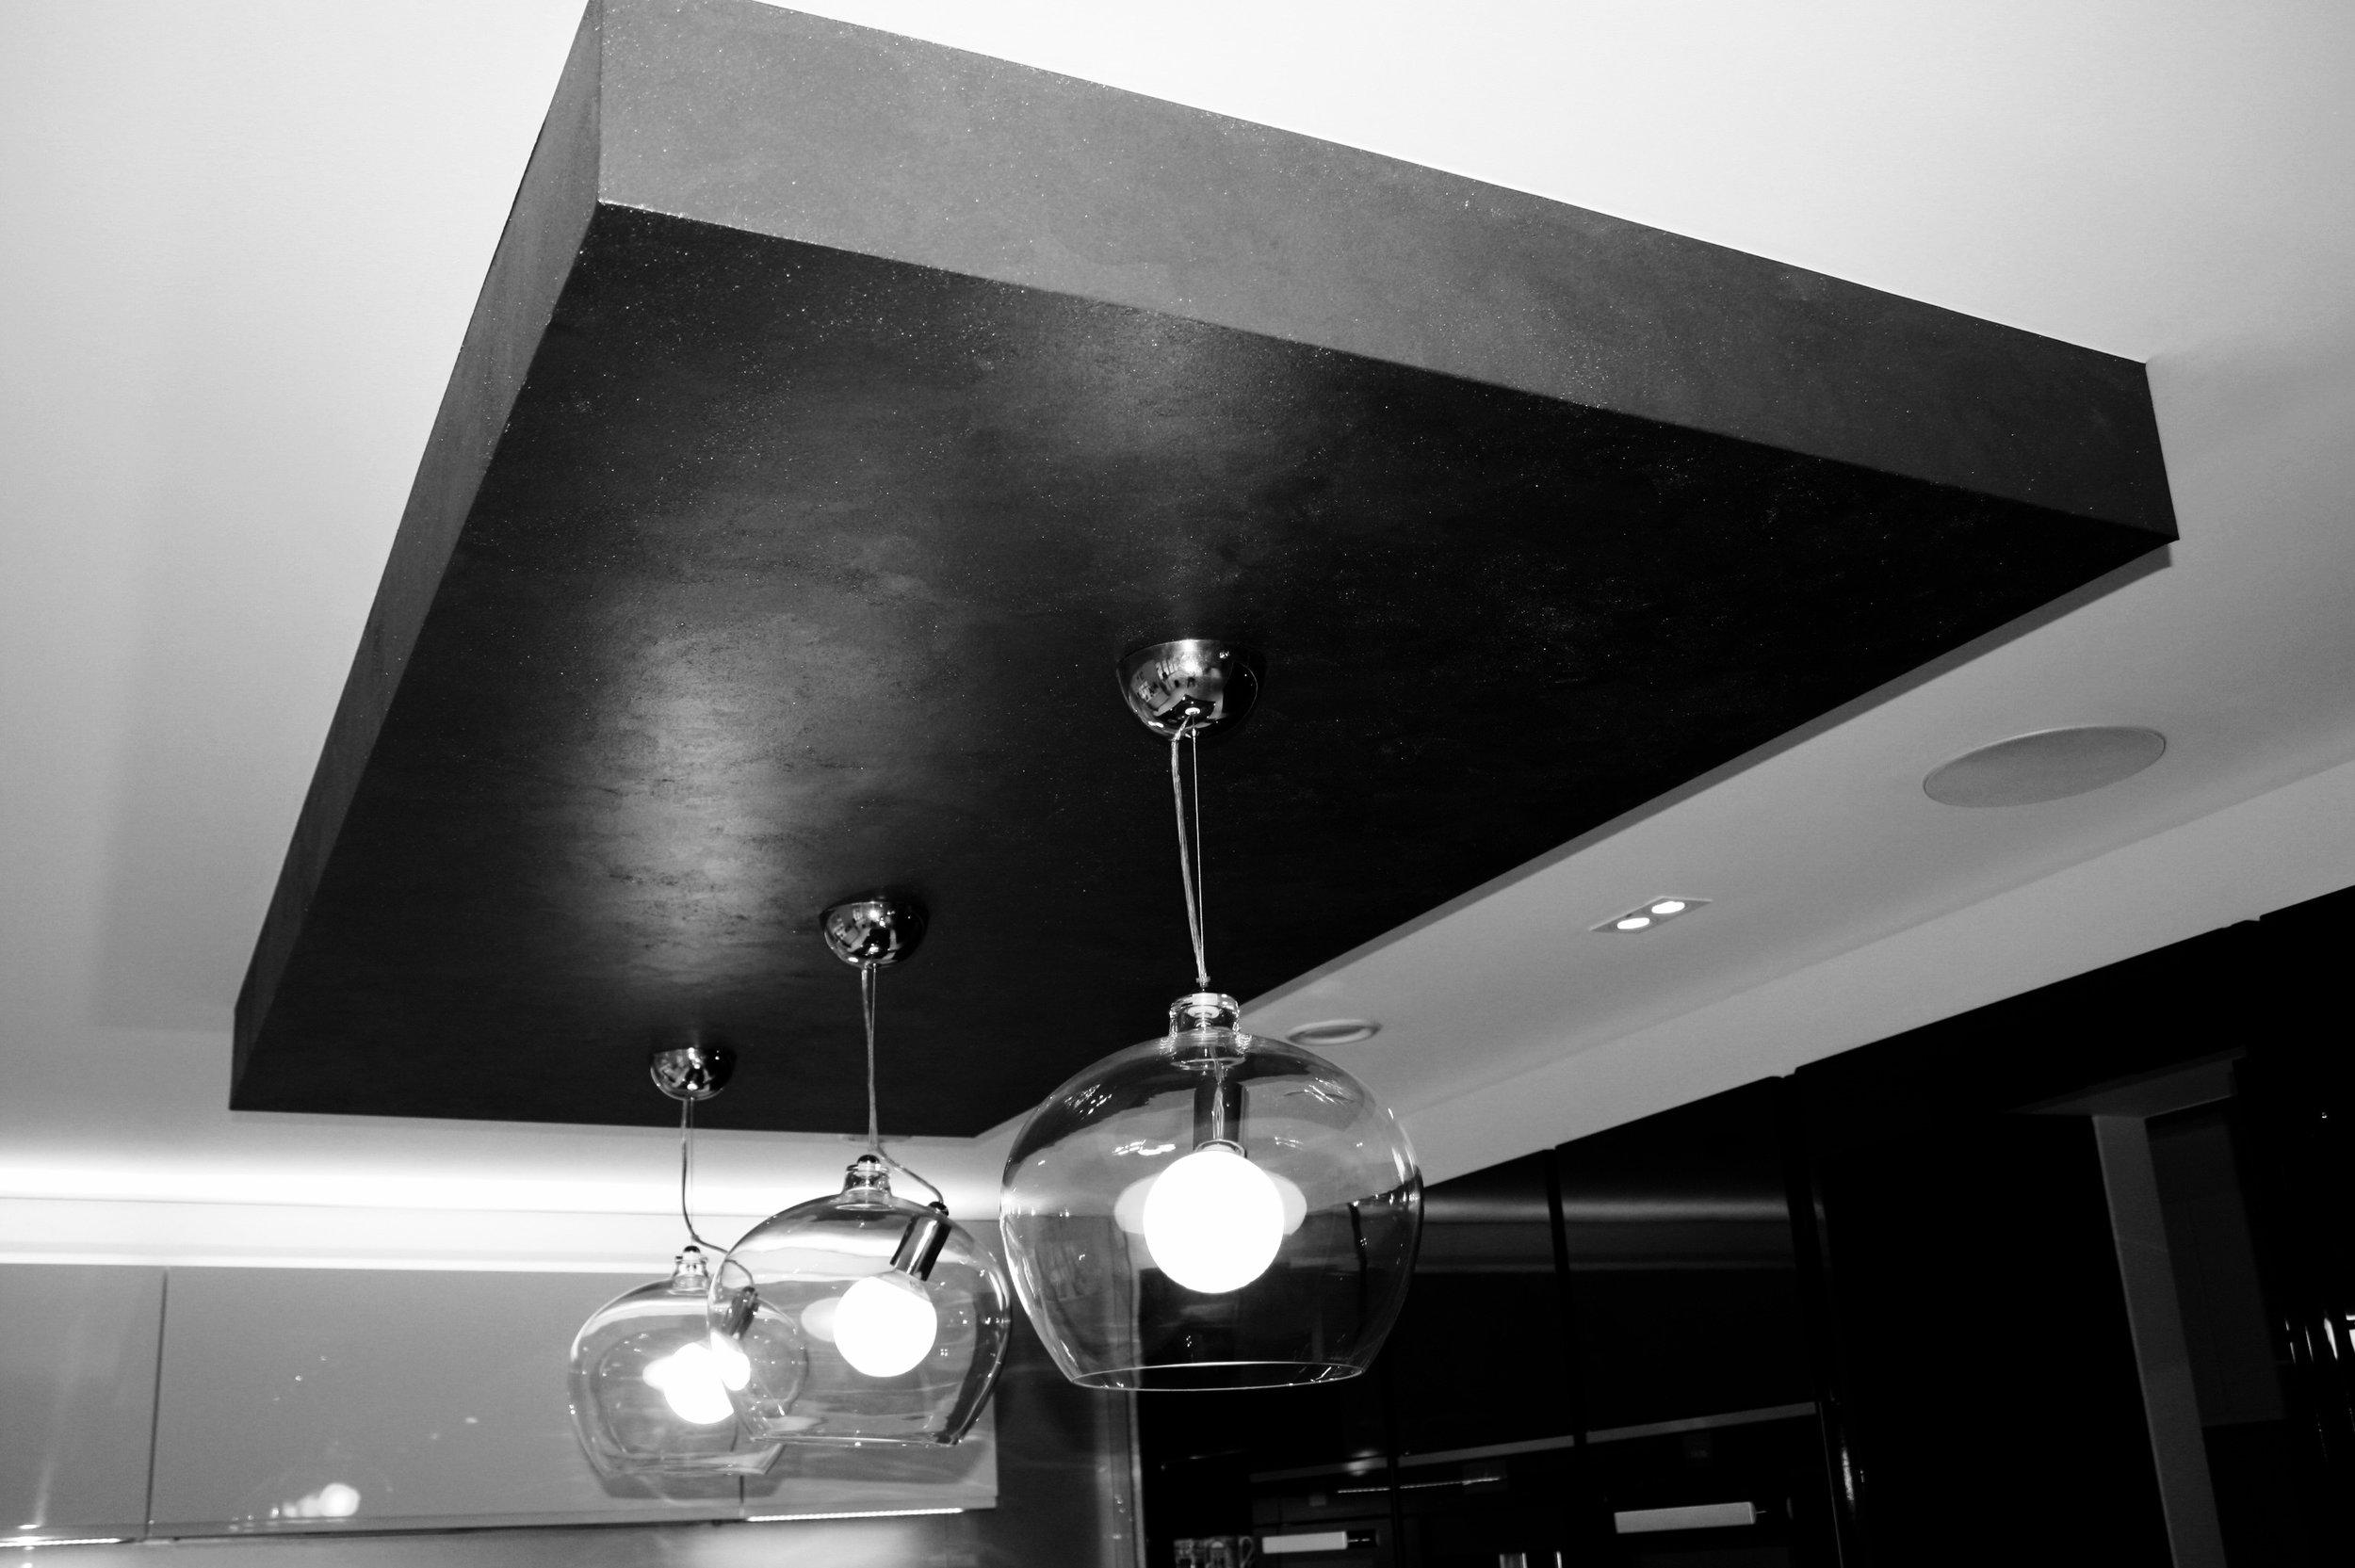 bespoke metallic graphite painted finish cieling island feature wall finish custom interiors jpg.1.jpg